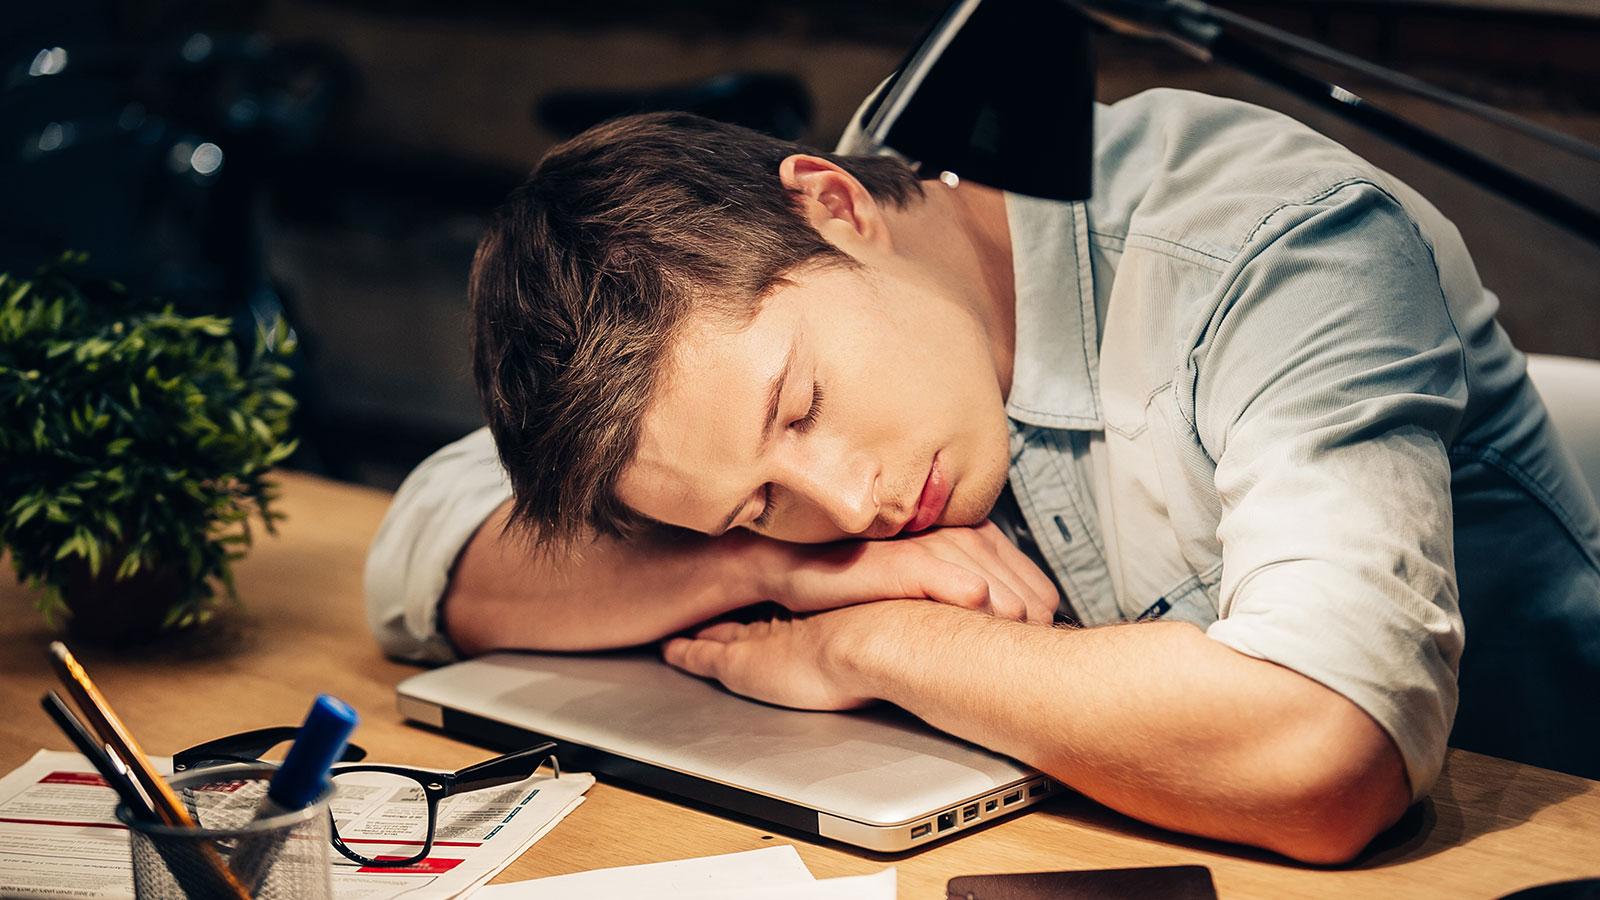 sono depois do almoço